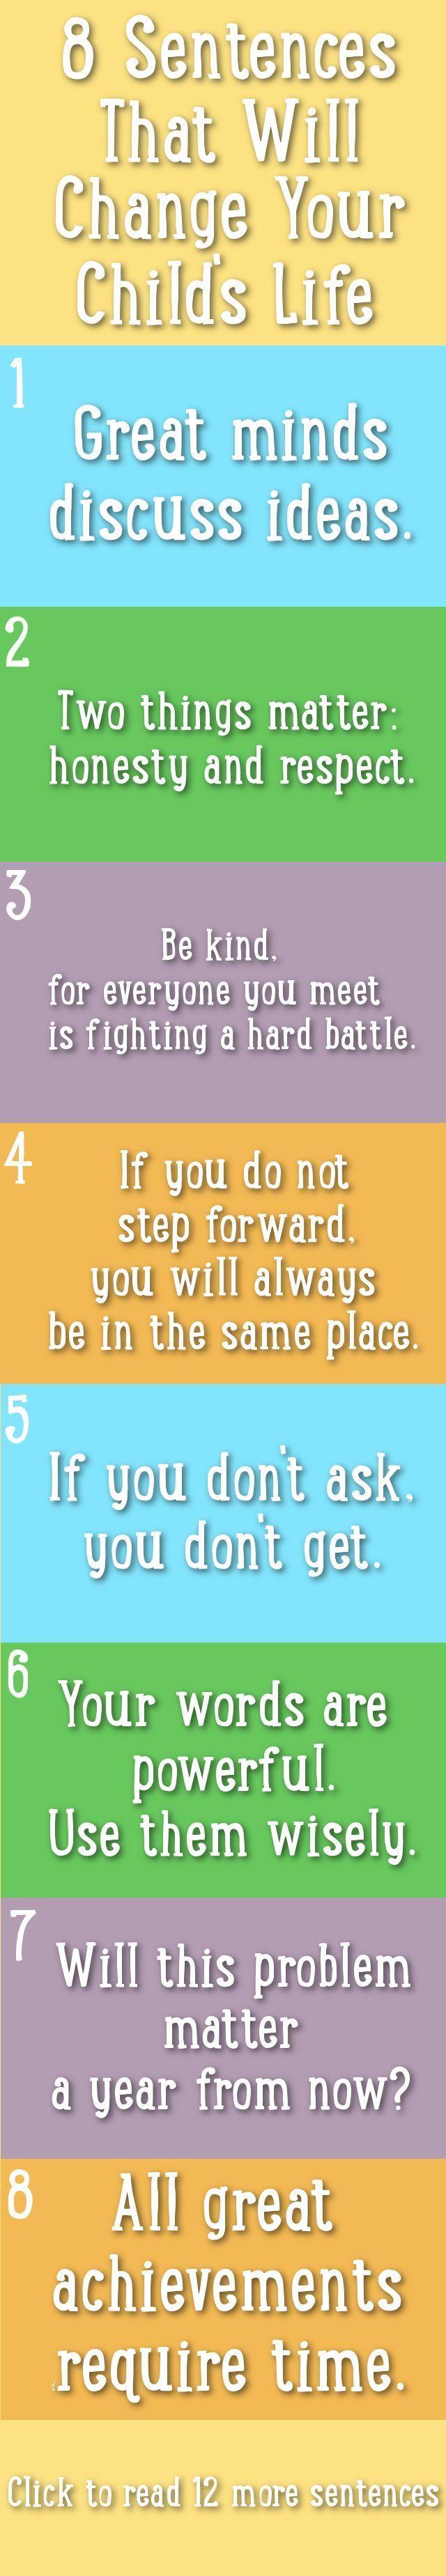 8 Sentences that will change your child's life. (scheduled via http://www.tailwindapp.com?utm_source=pinterest&utm_medium=twpin&utm_content=post135249759&utm_campaign=scheduler_attribution)